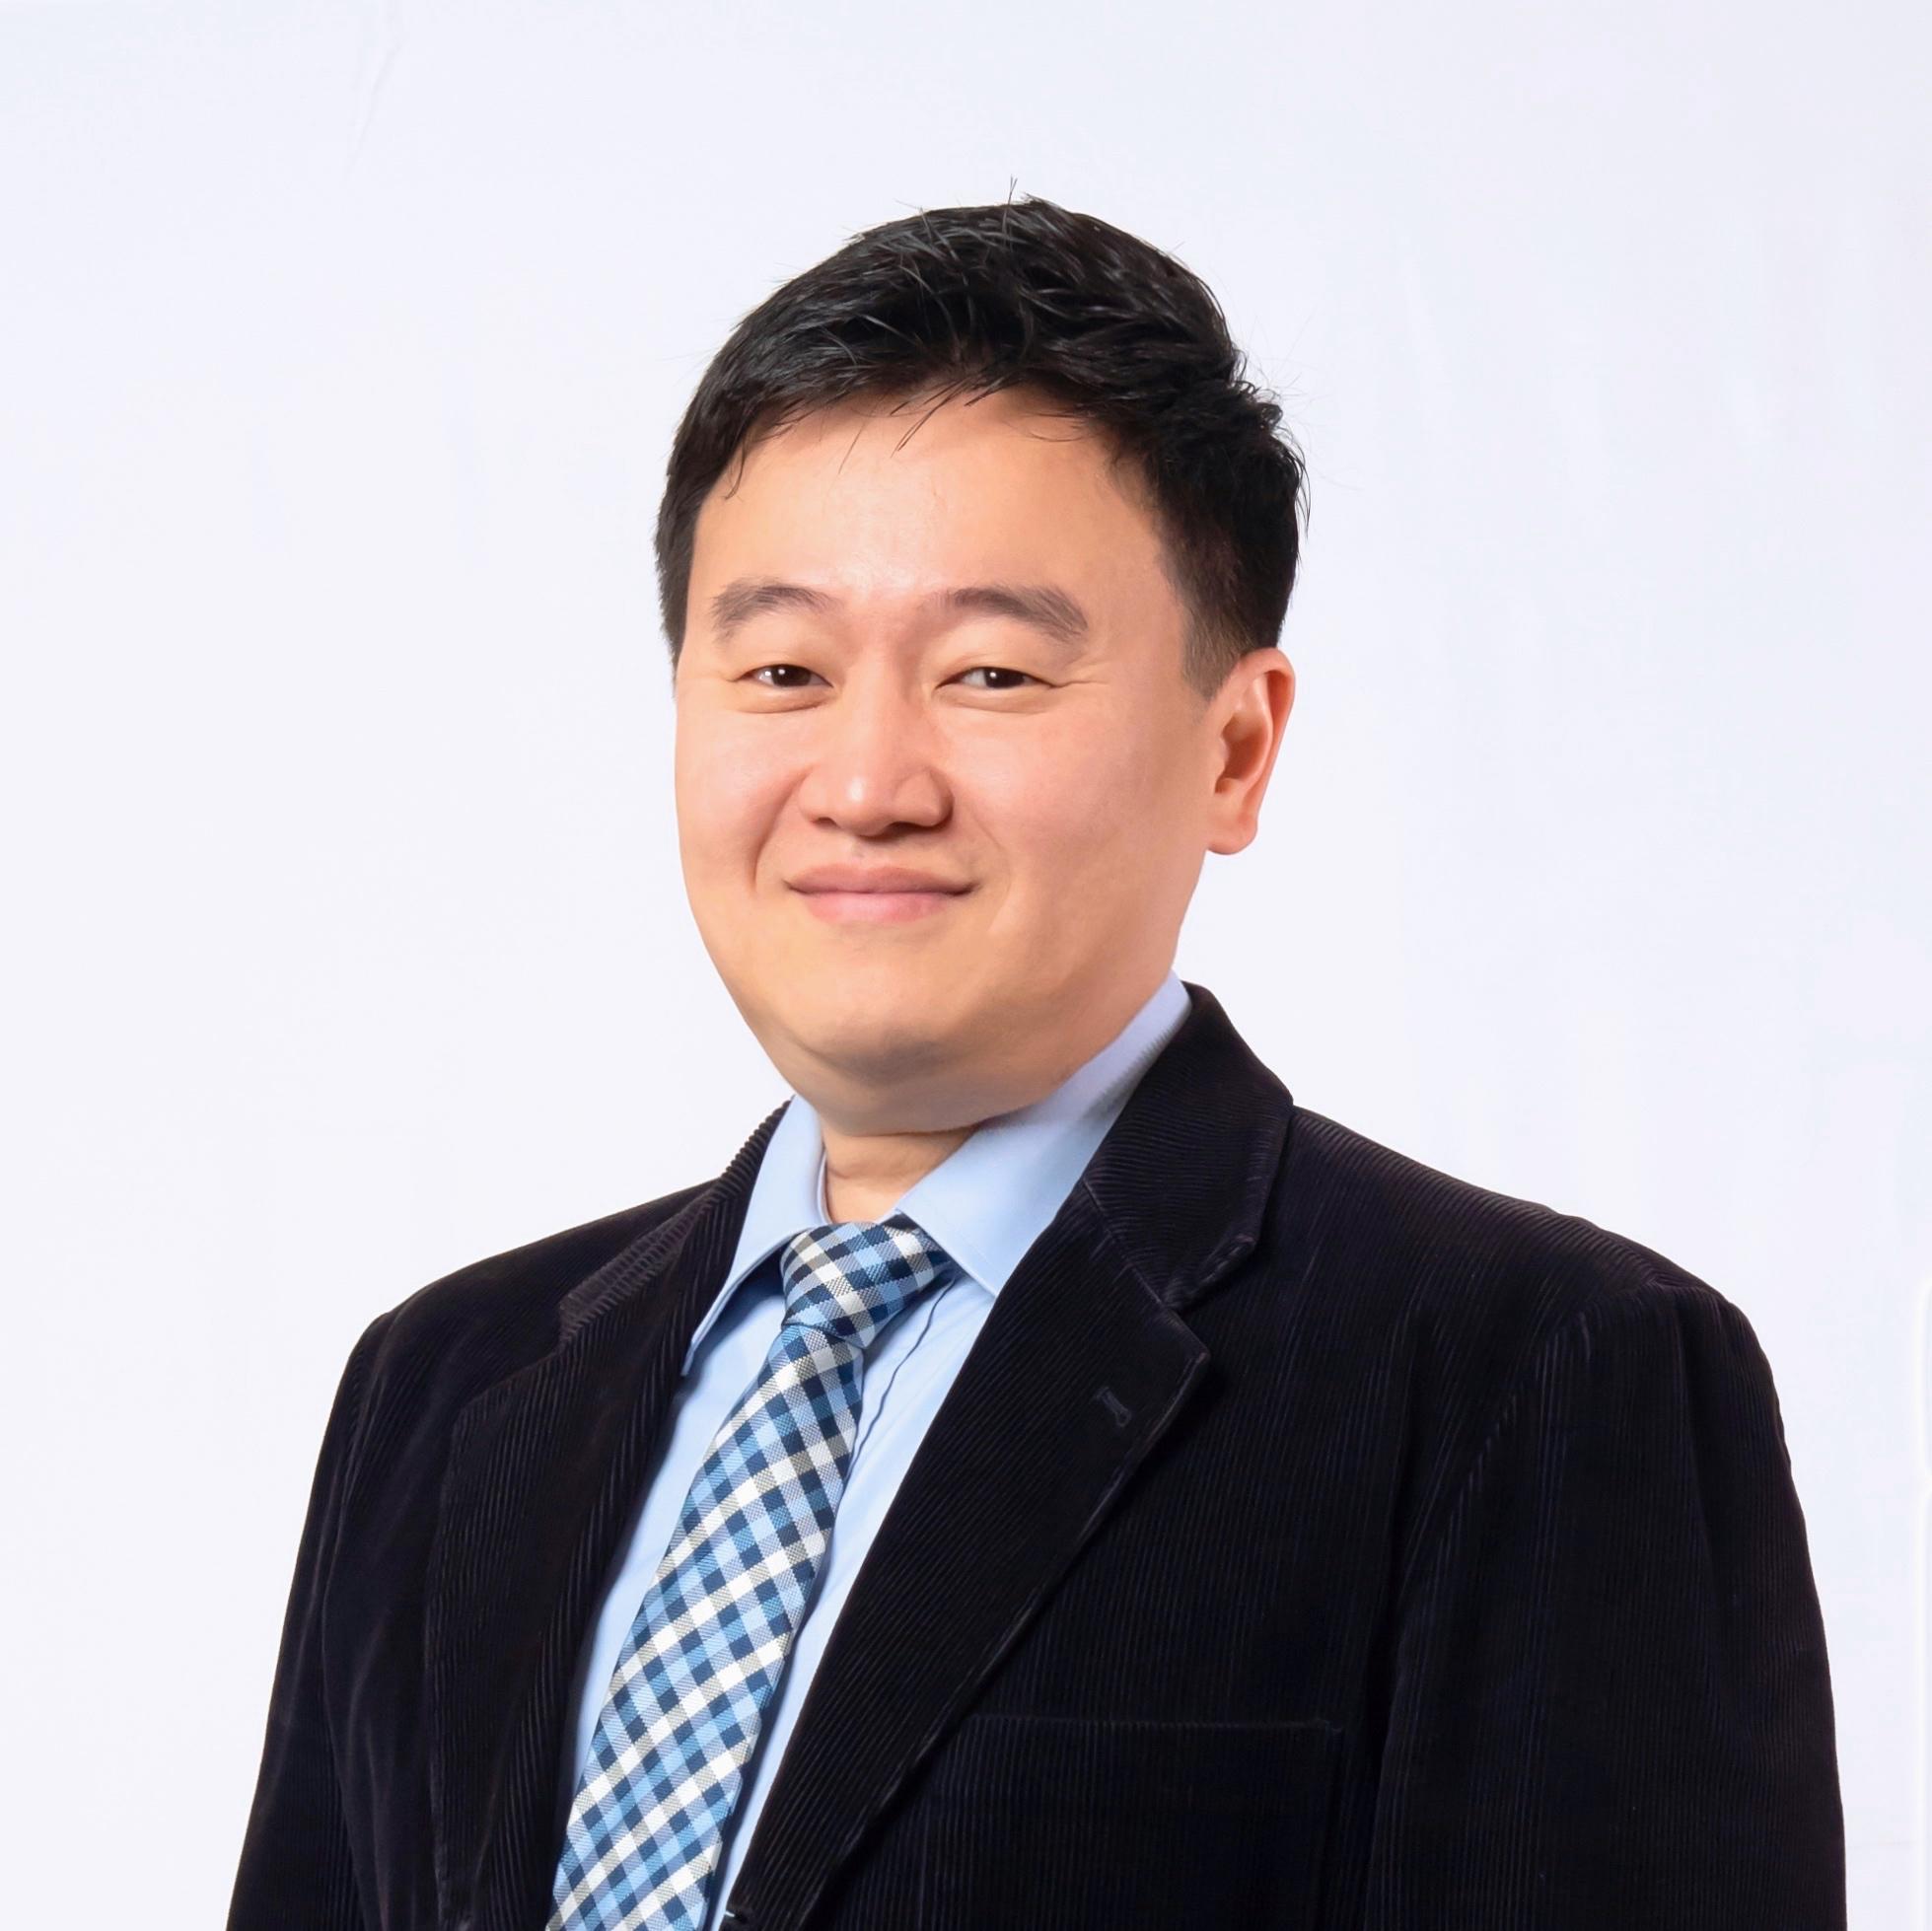 Donnie Bae 전도사